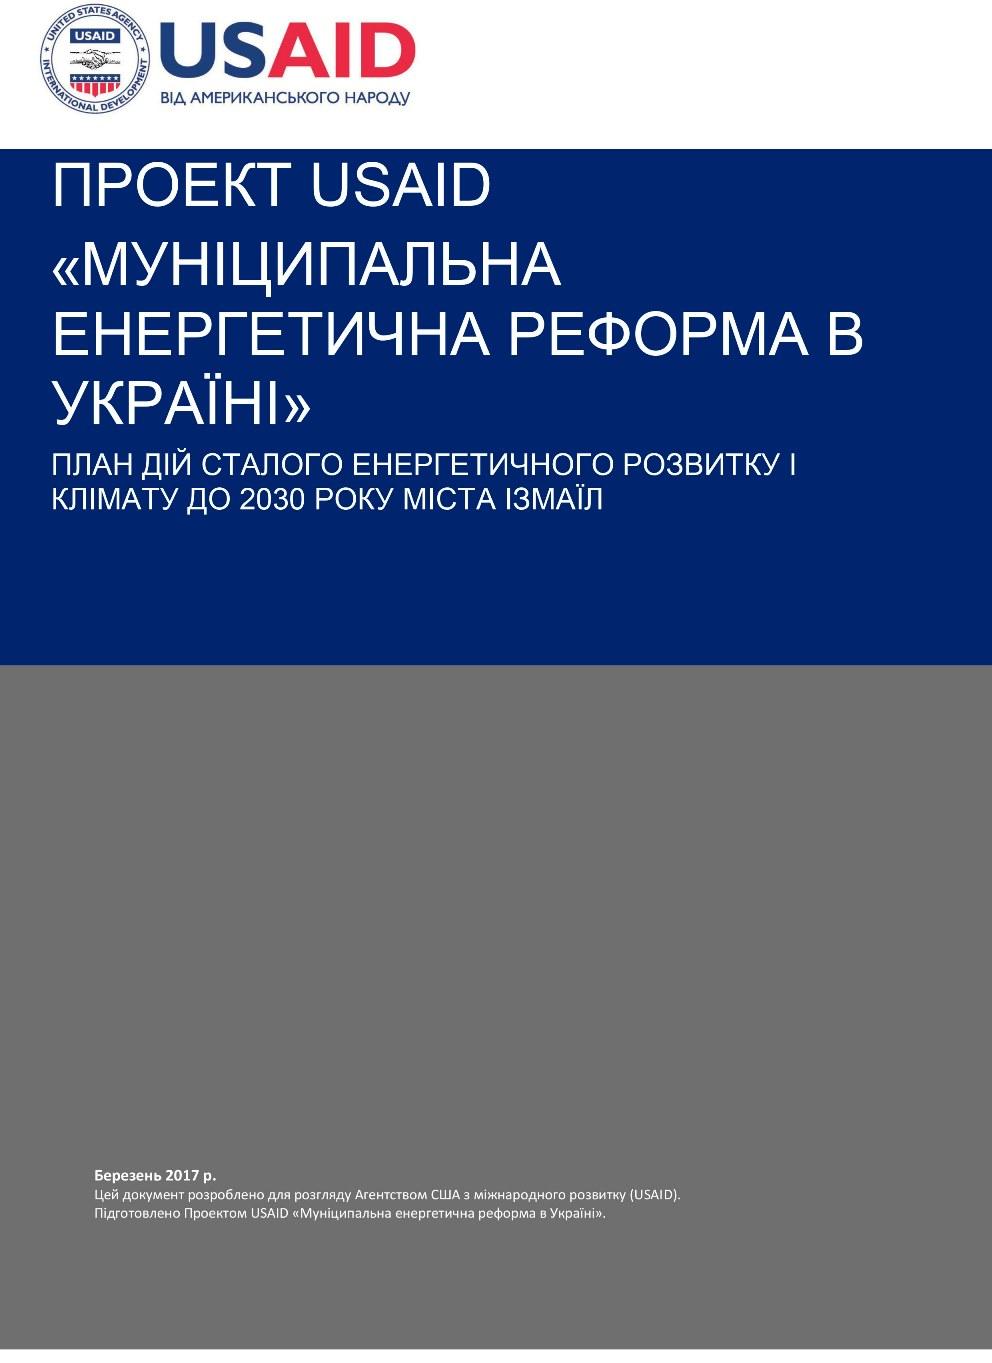 MERP_2.7_SECAP_Izmail_030317-1